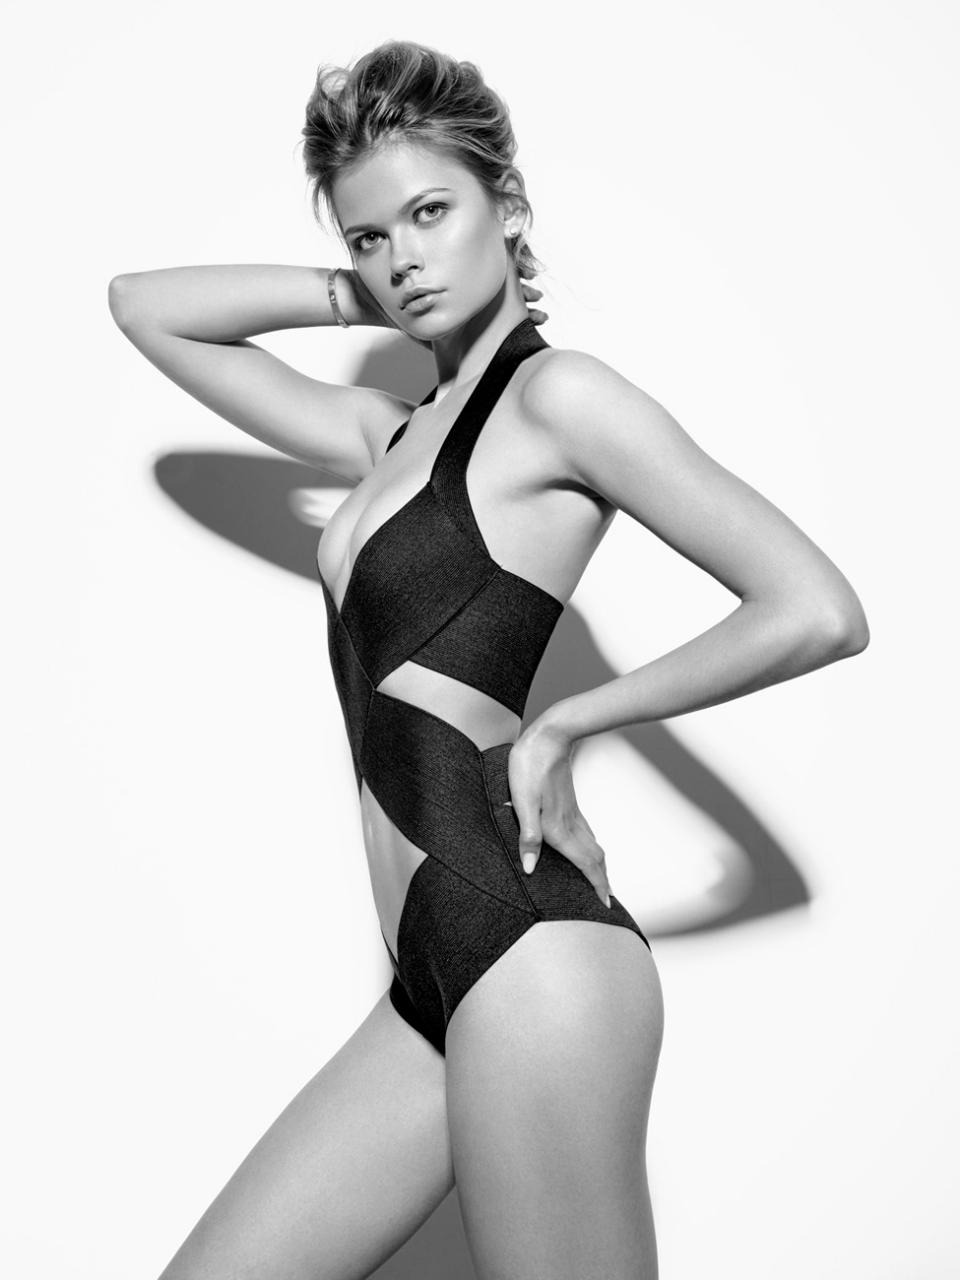 Konstantin Kryukovskiy最新时尚人像摄影作品 审美灵感 第11张